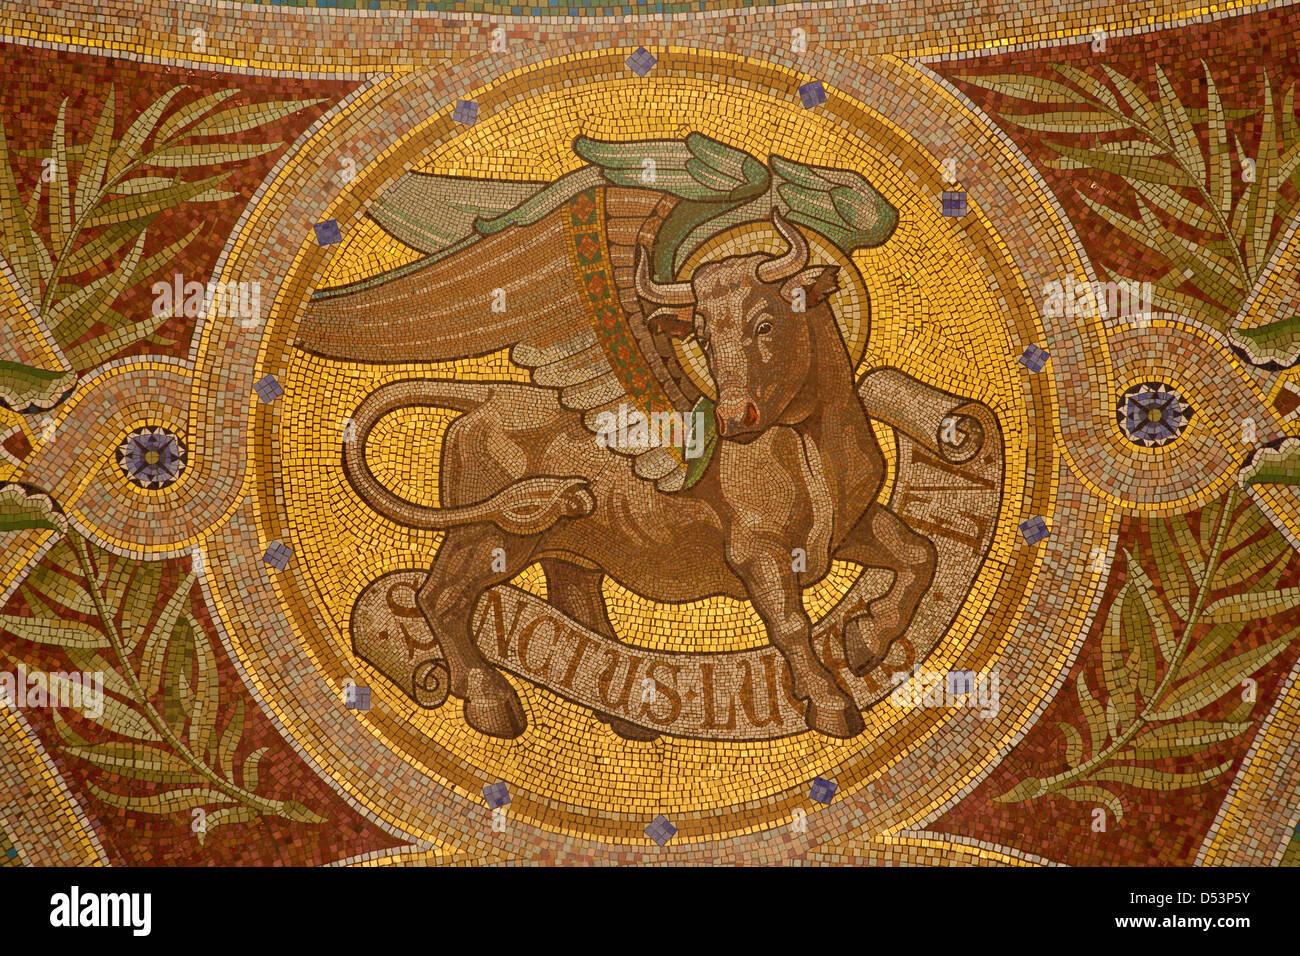 Madrid March 9 Mosaic Of Bull As Symbol Of Saint Luke The Stock